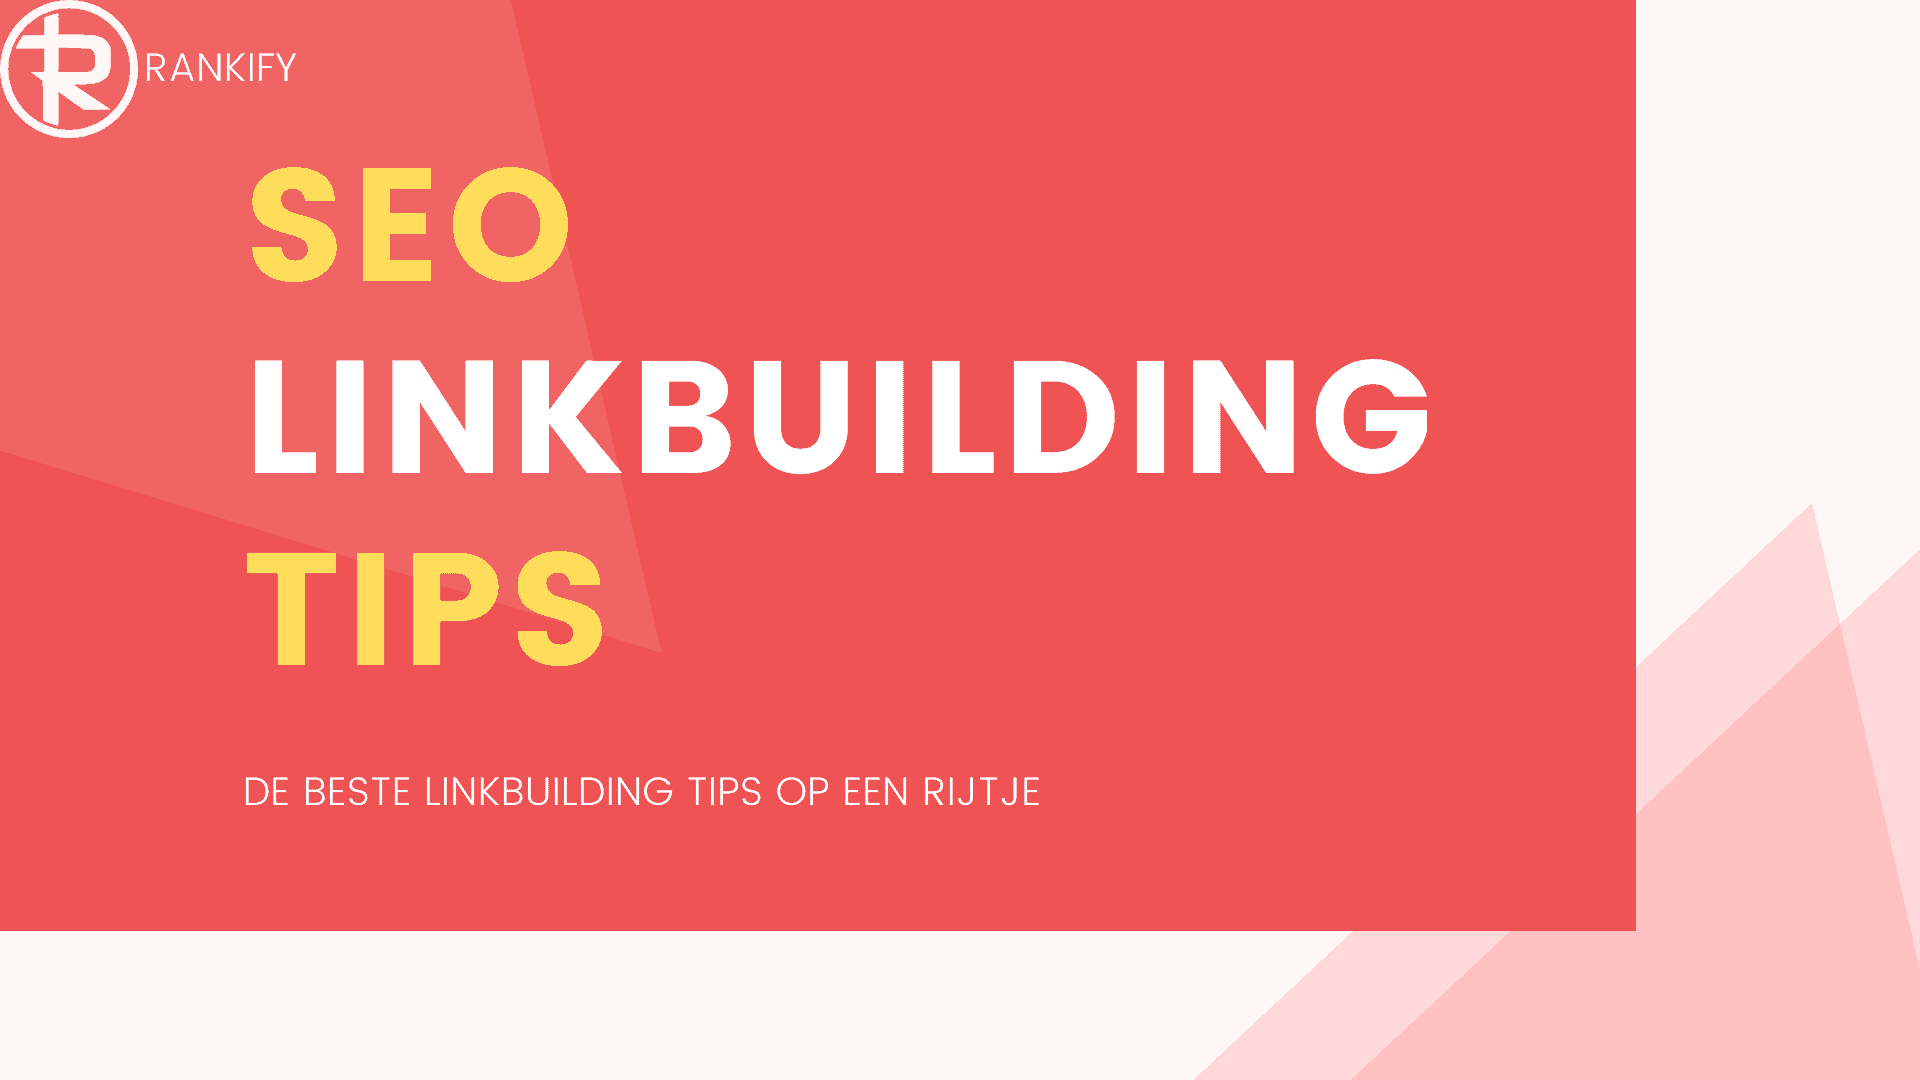 seo linkbuilding tips